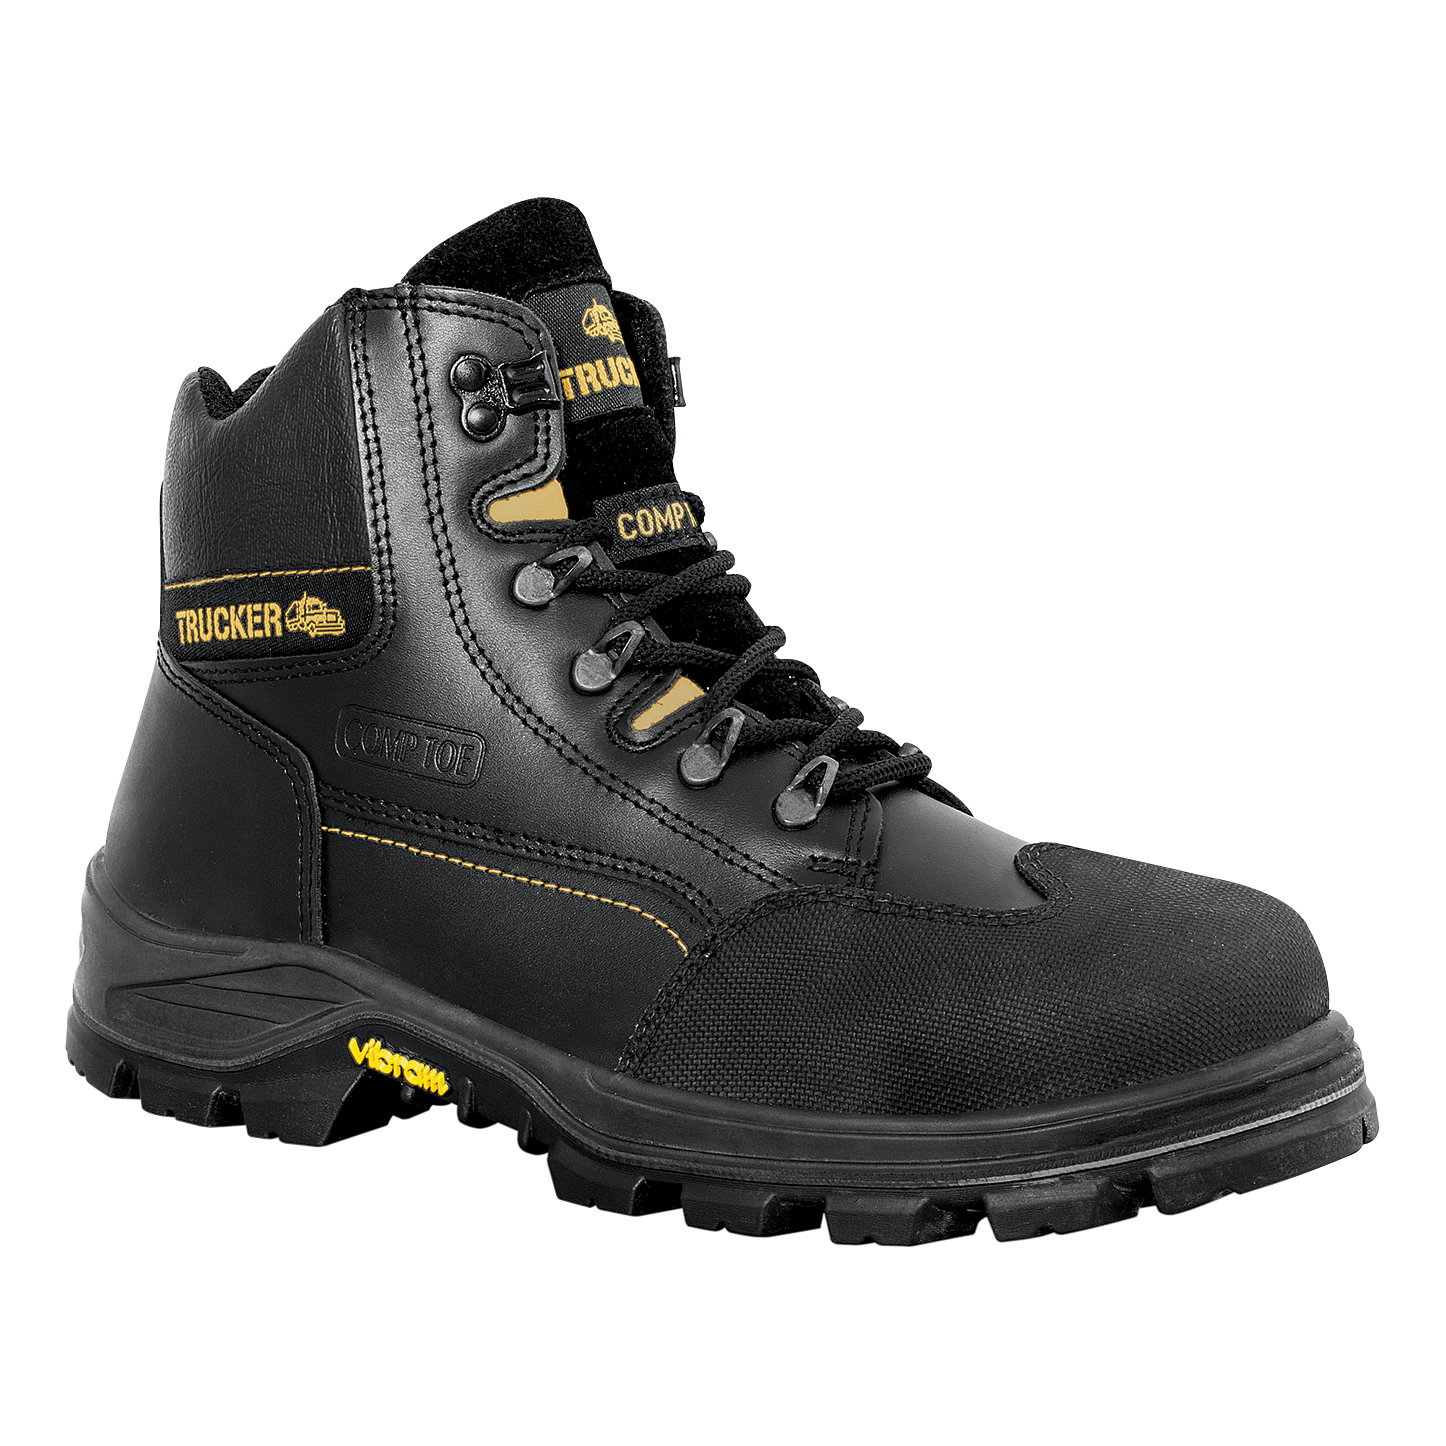 Aimont Revenger Safety Boots Protective Toecap Size 11 Black Ref 7TR0611 Pair